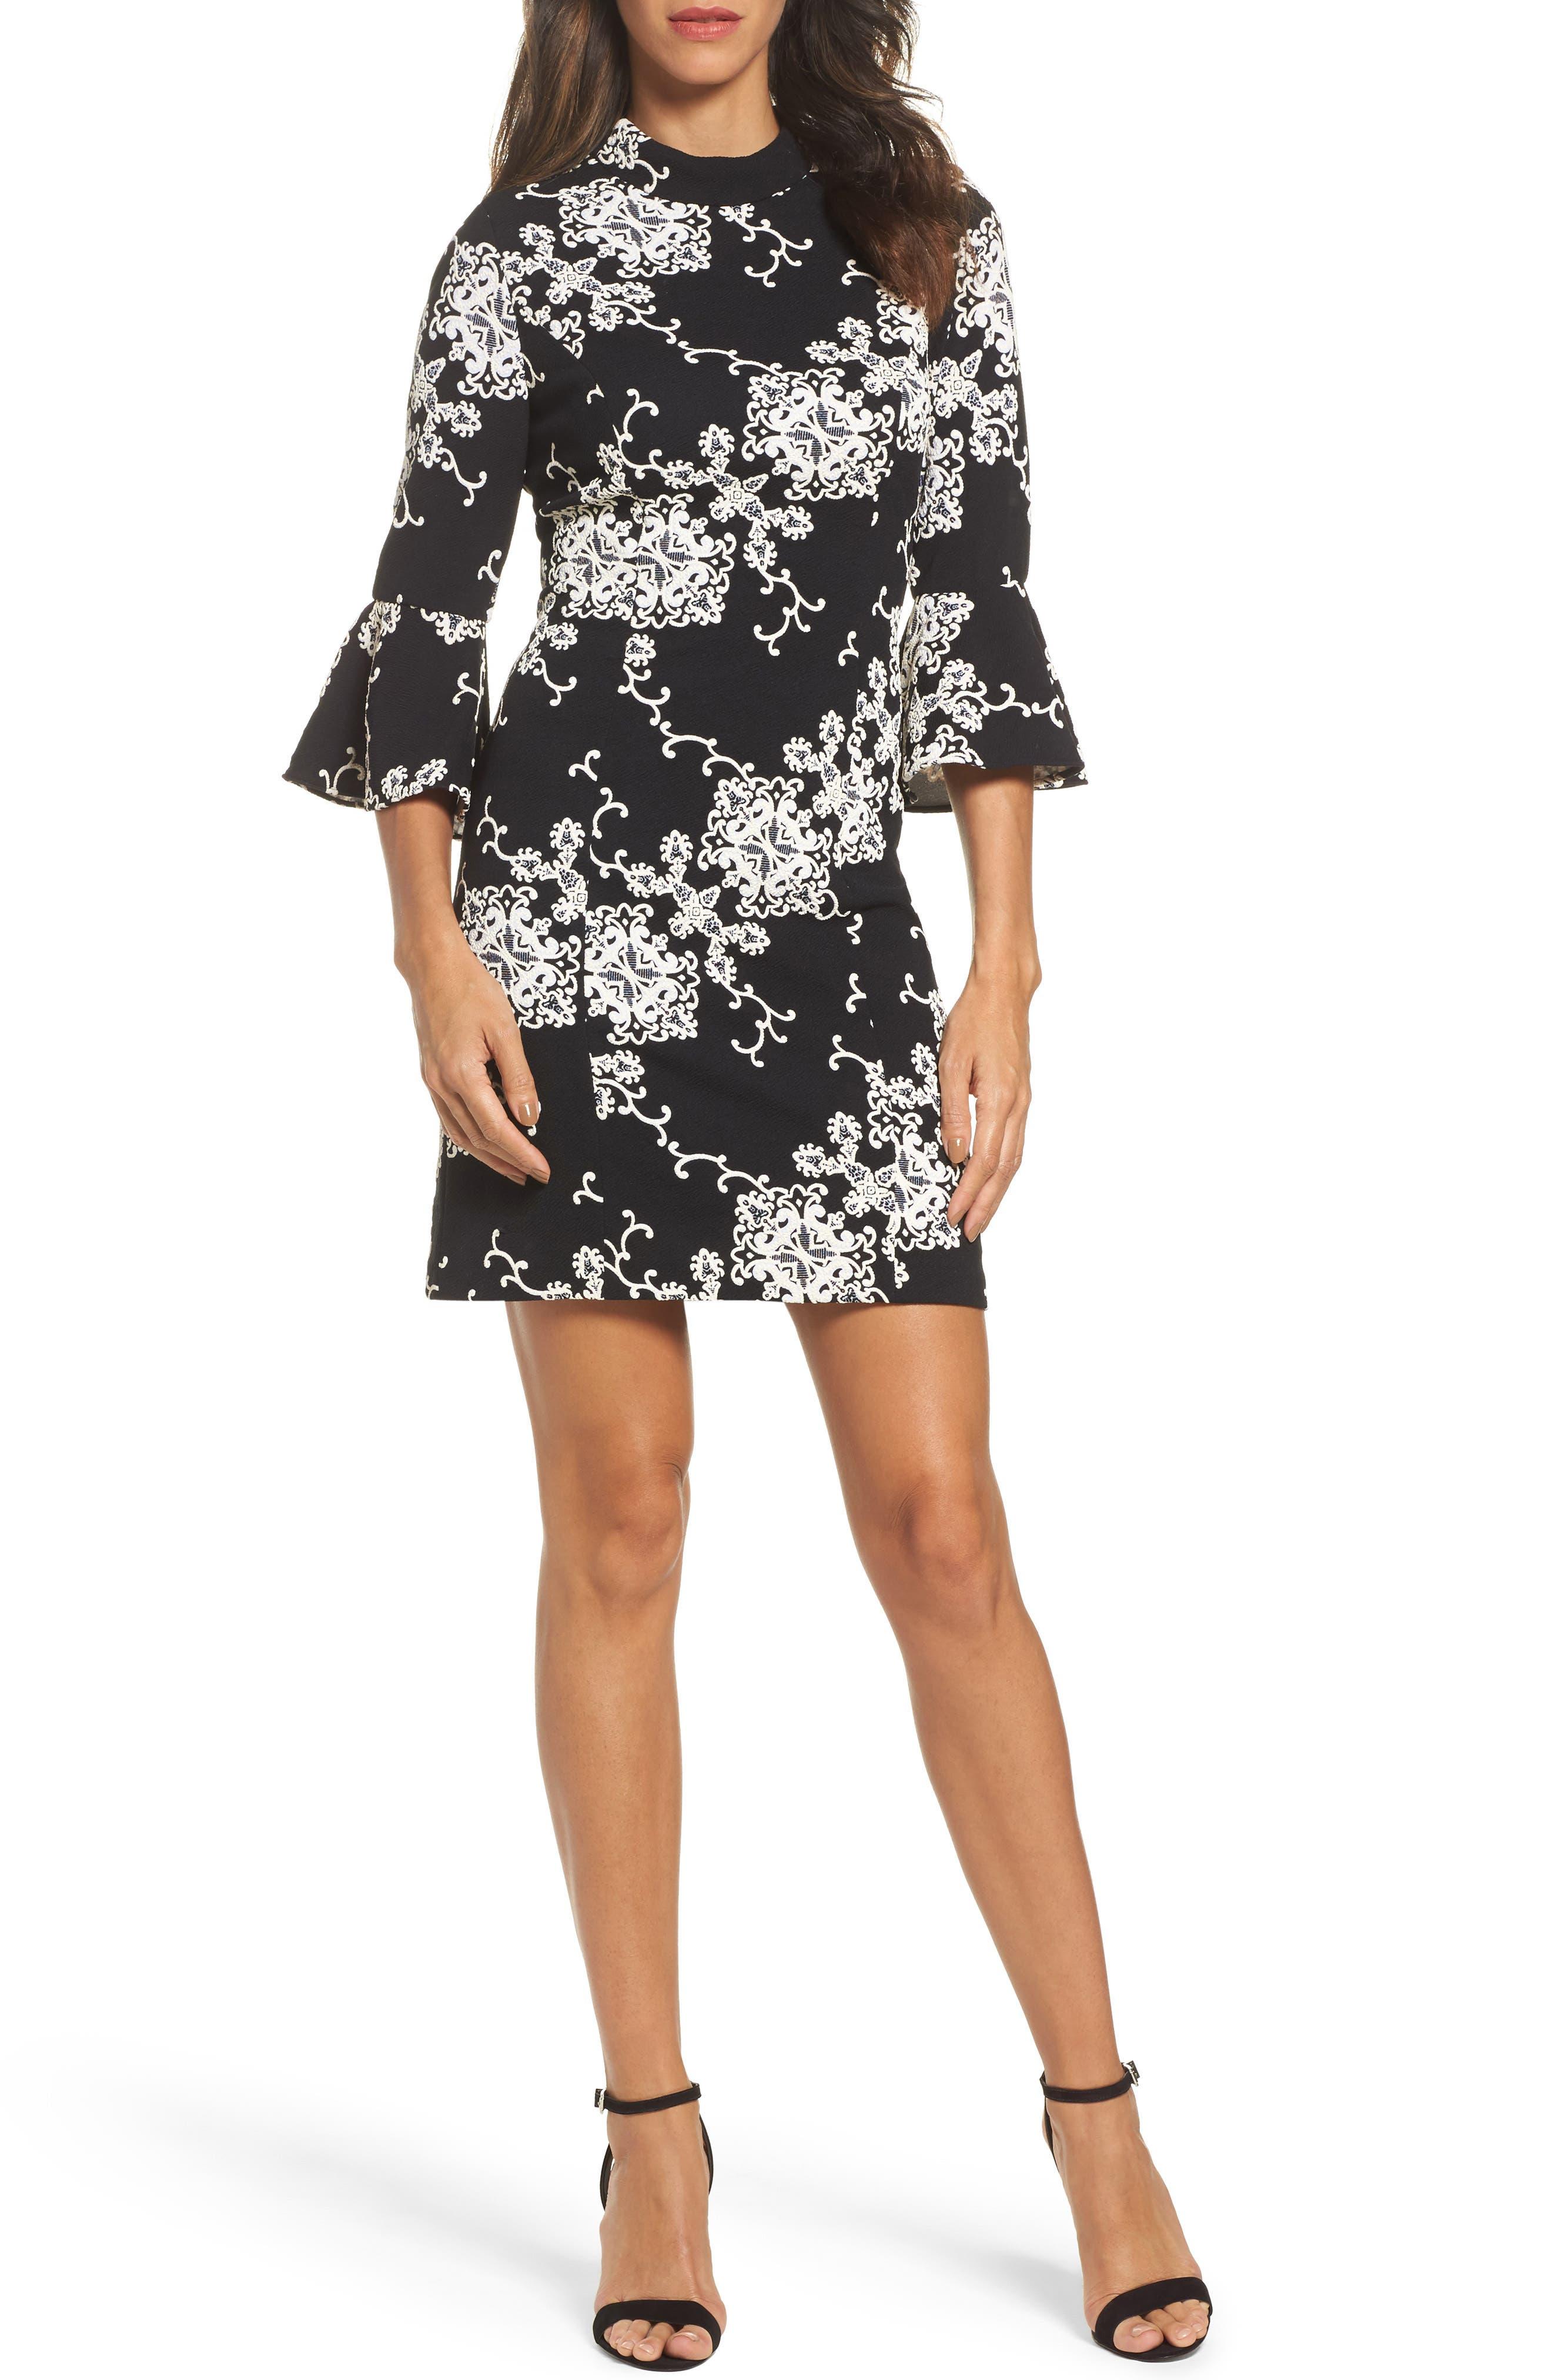 Alternate Image 1 Selected - Adrianna Papell Flare Sleeve Sheath Dress